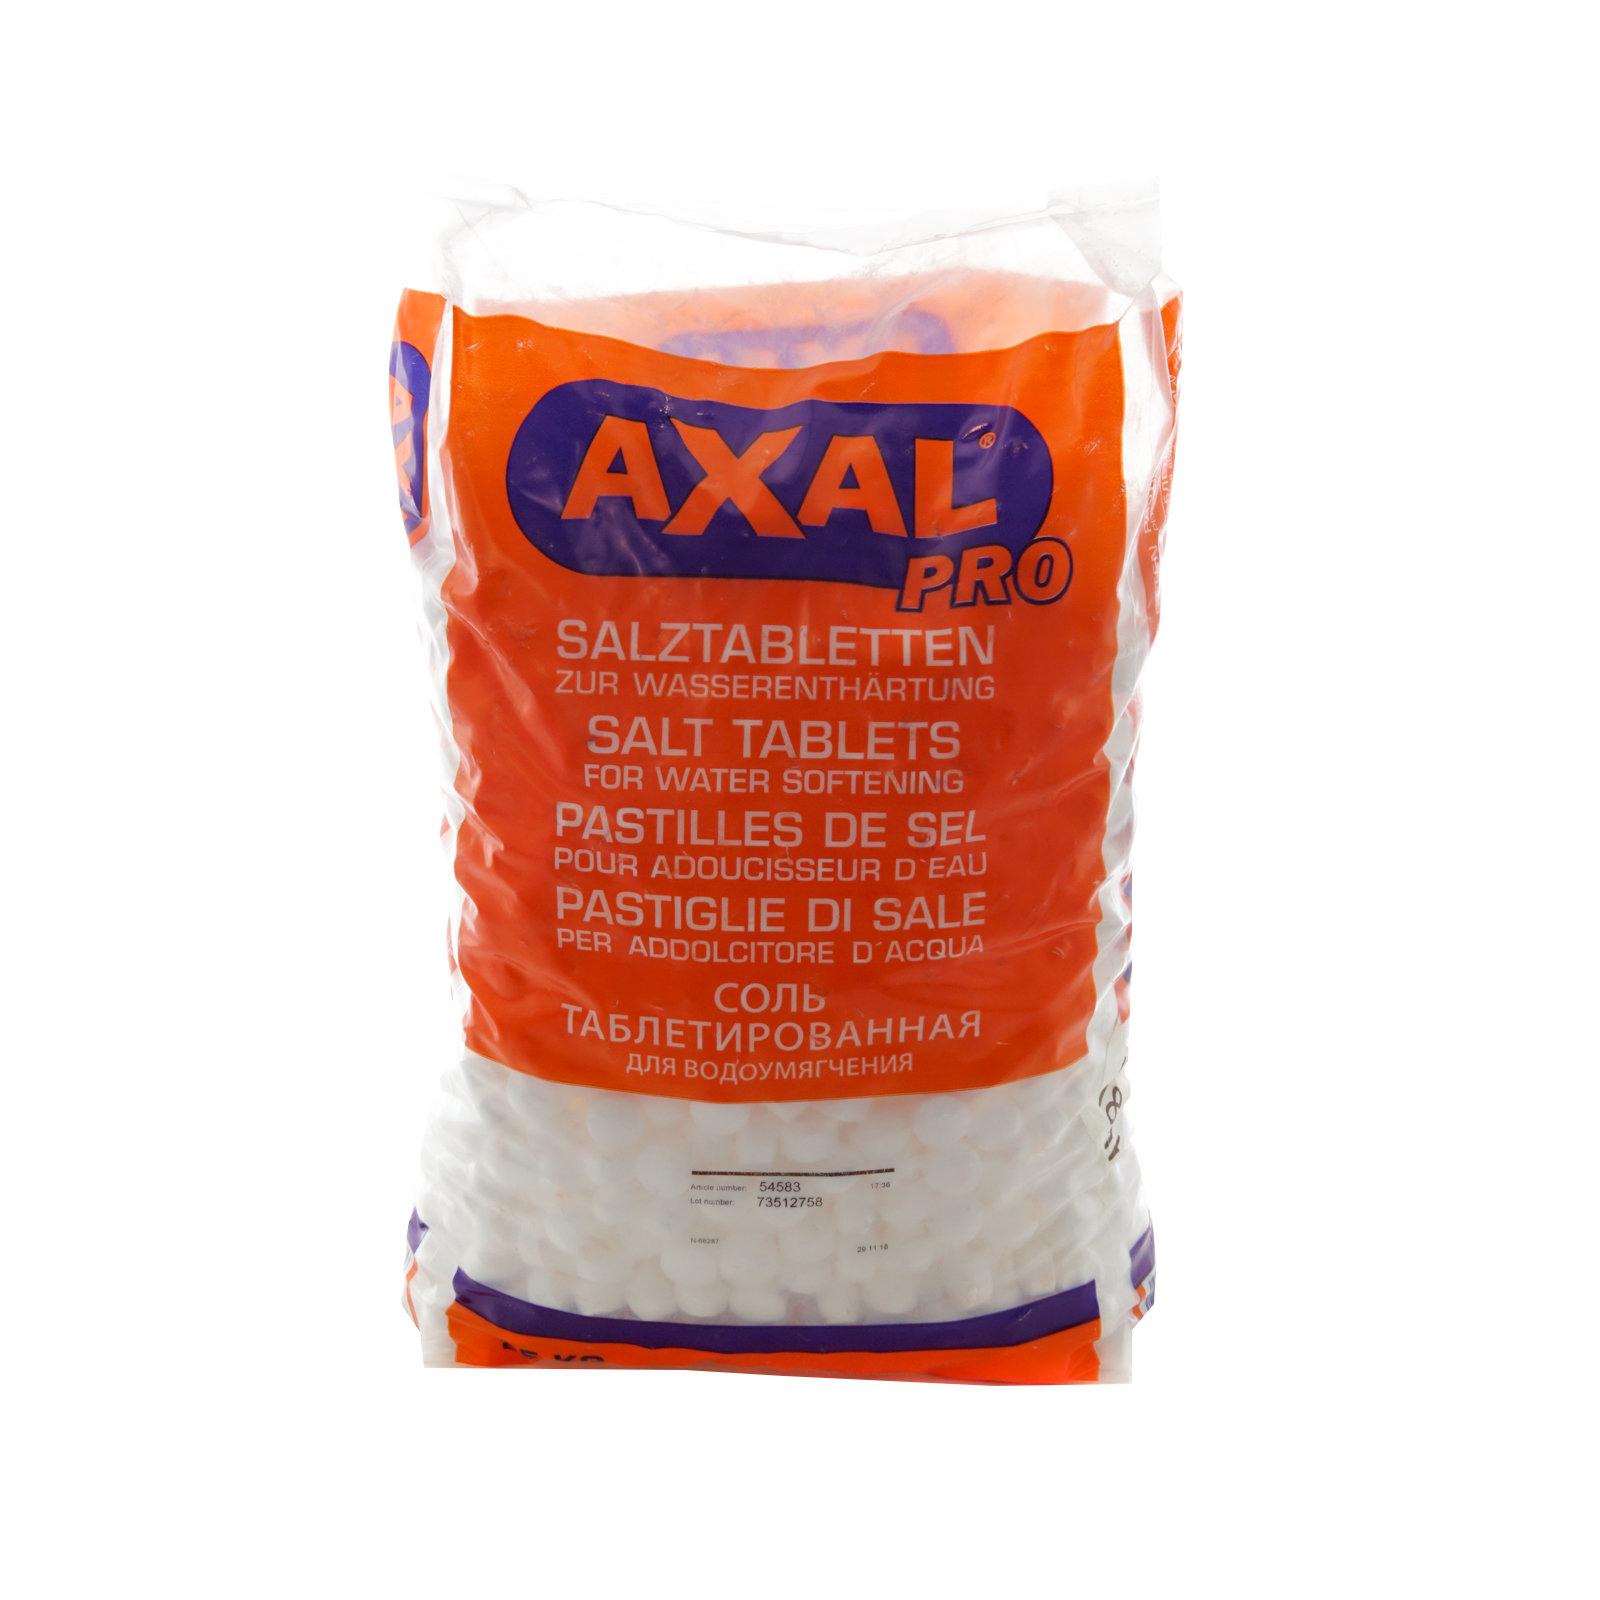 AXAL – SALE IN PASTIGLIE DA KG 25